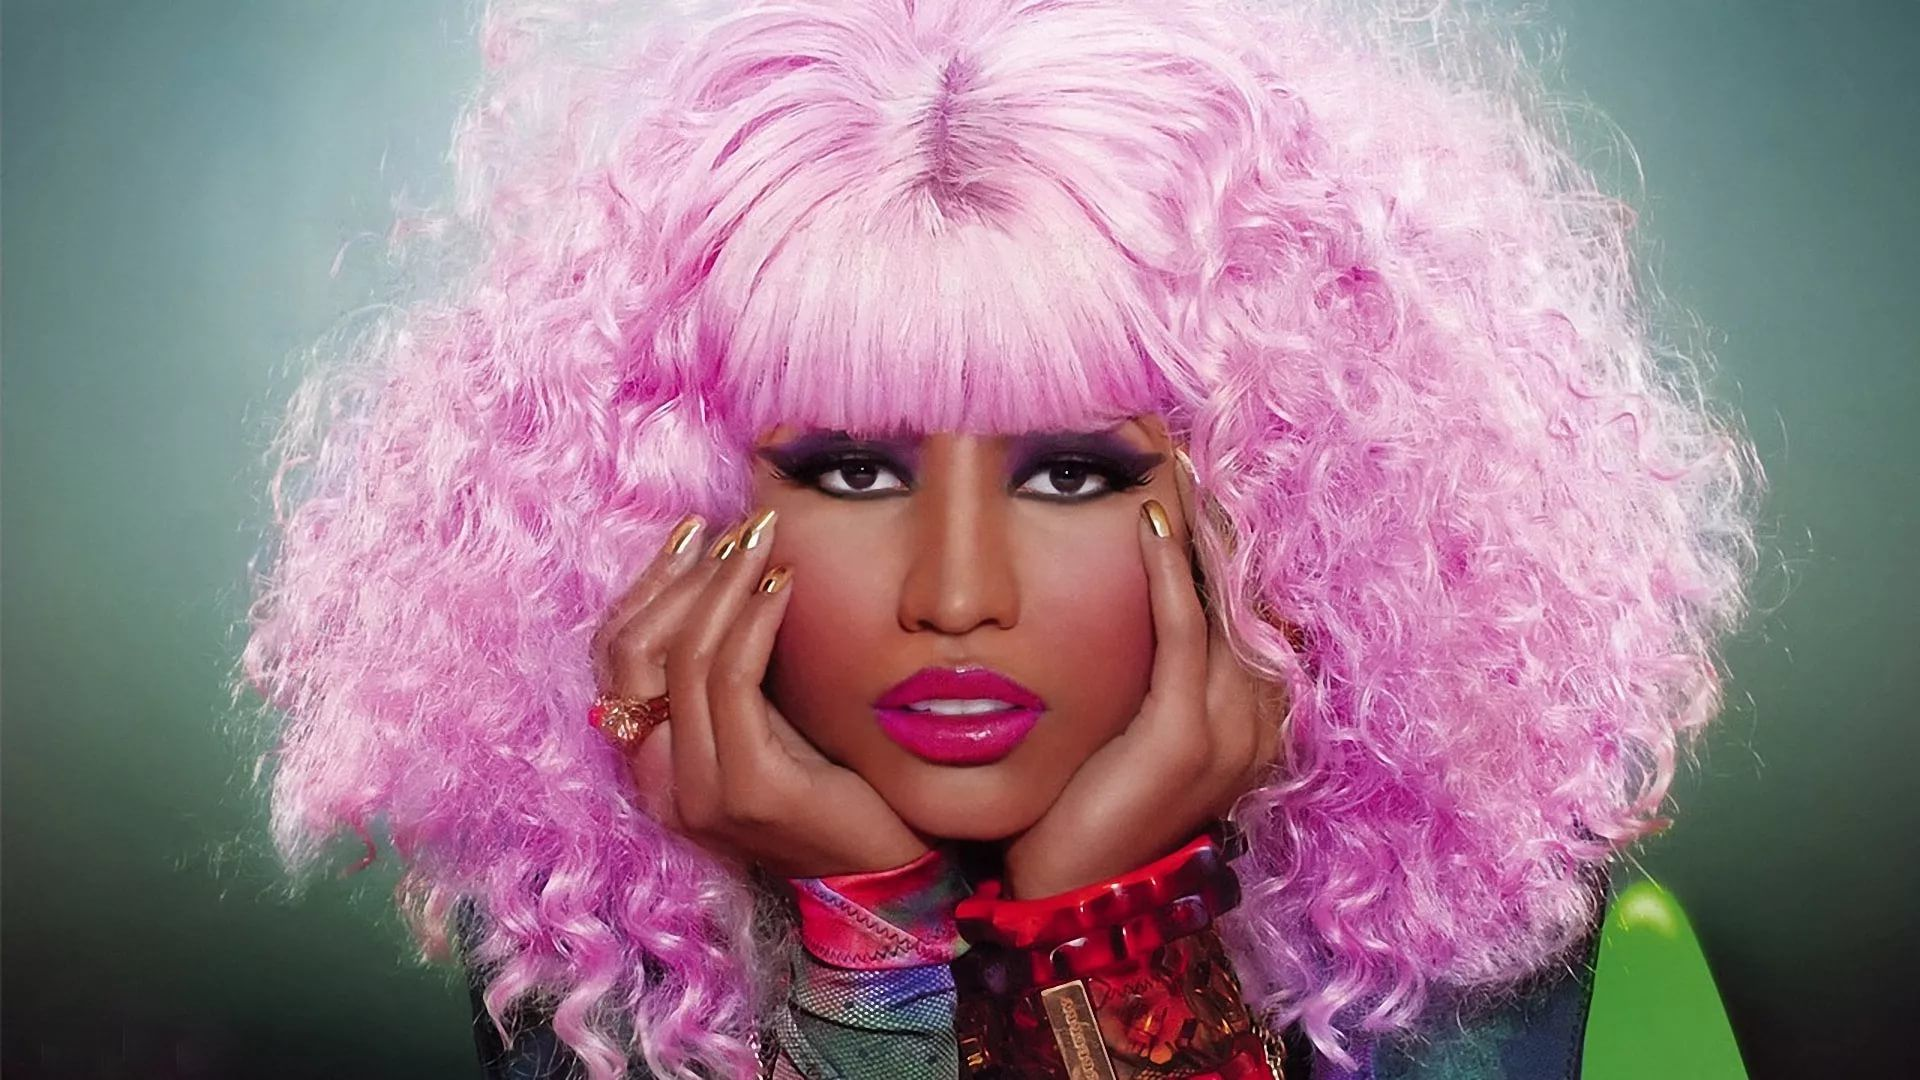 Nicki Minaj hd wallpaper 1080